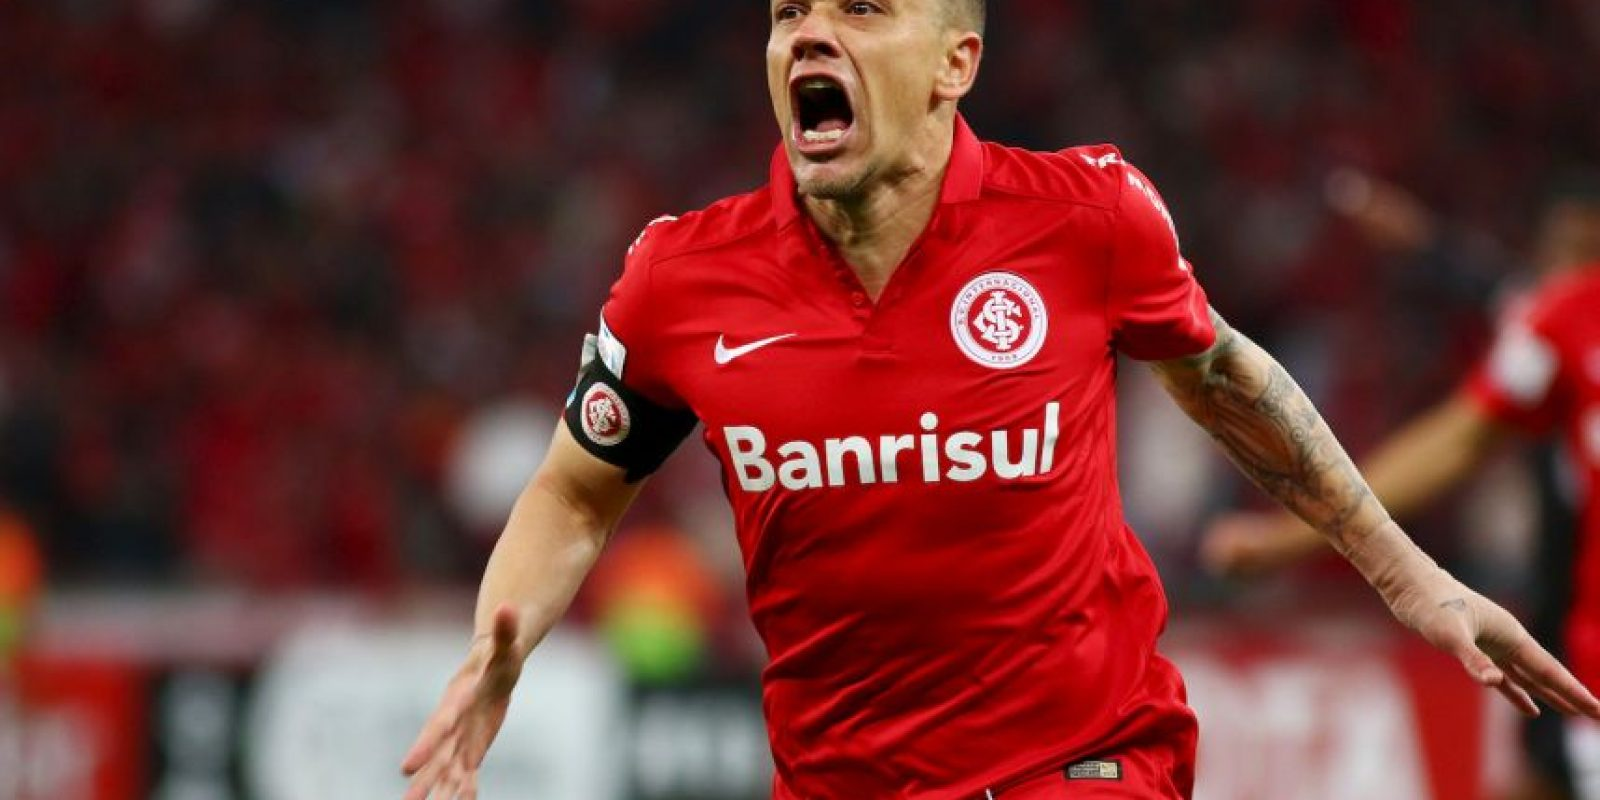 Los goles de fueron de Andrés D'Alessandro. Foto:Getty Images